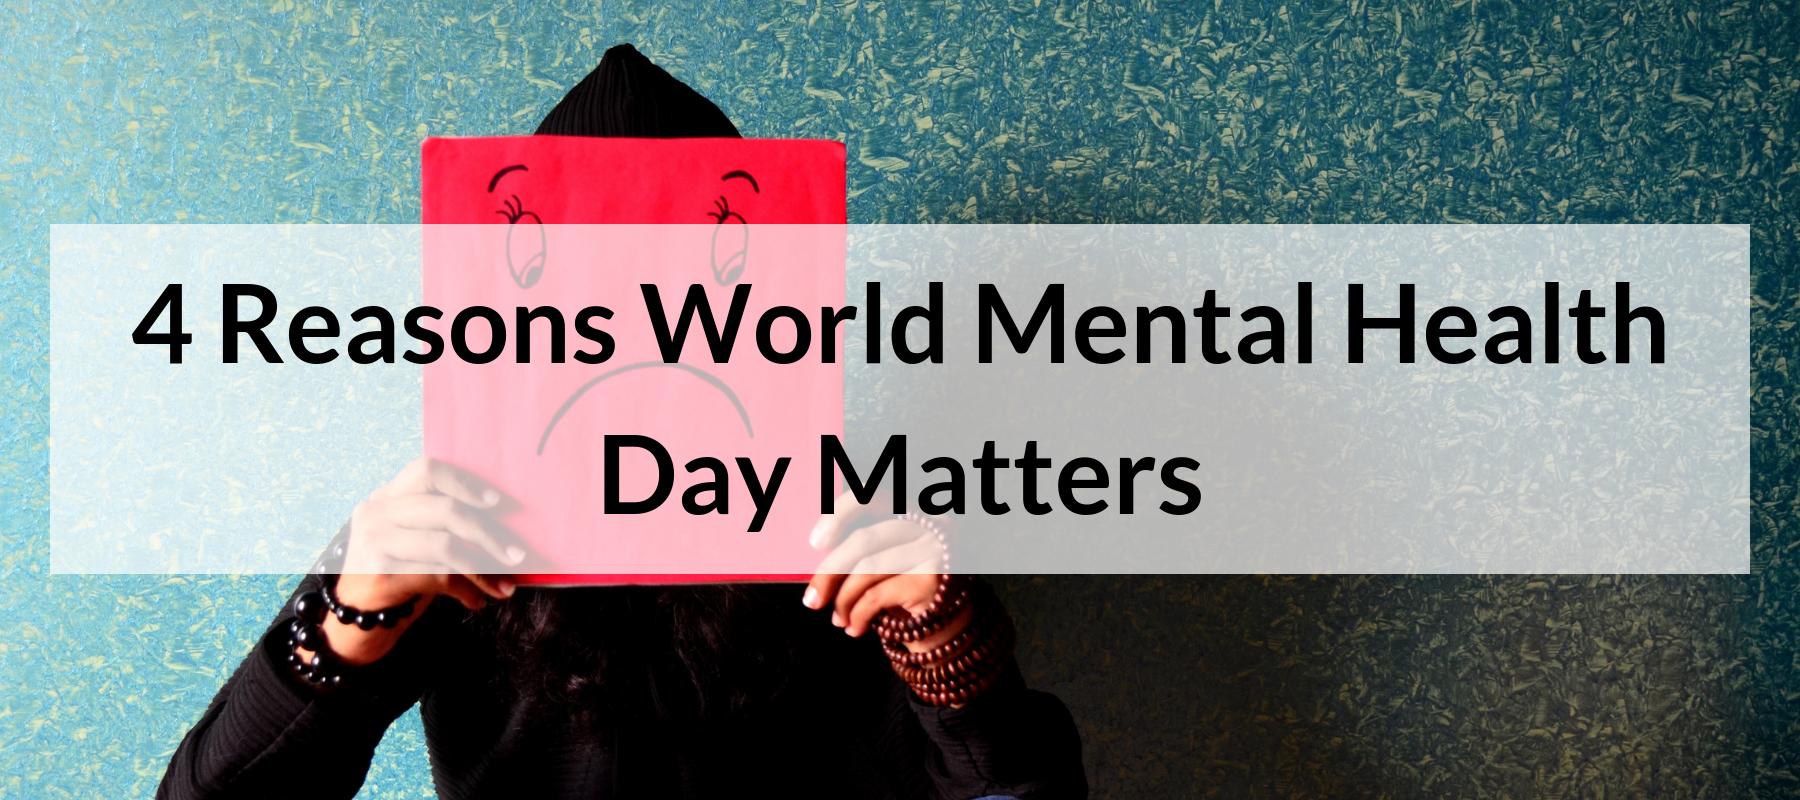 4 Reasons World Mental Health Day Matters